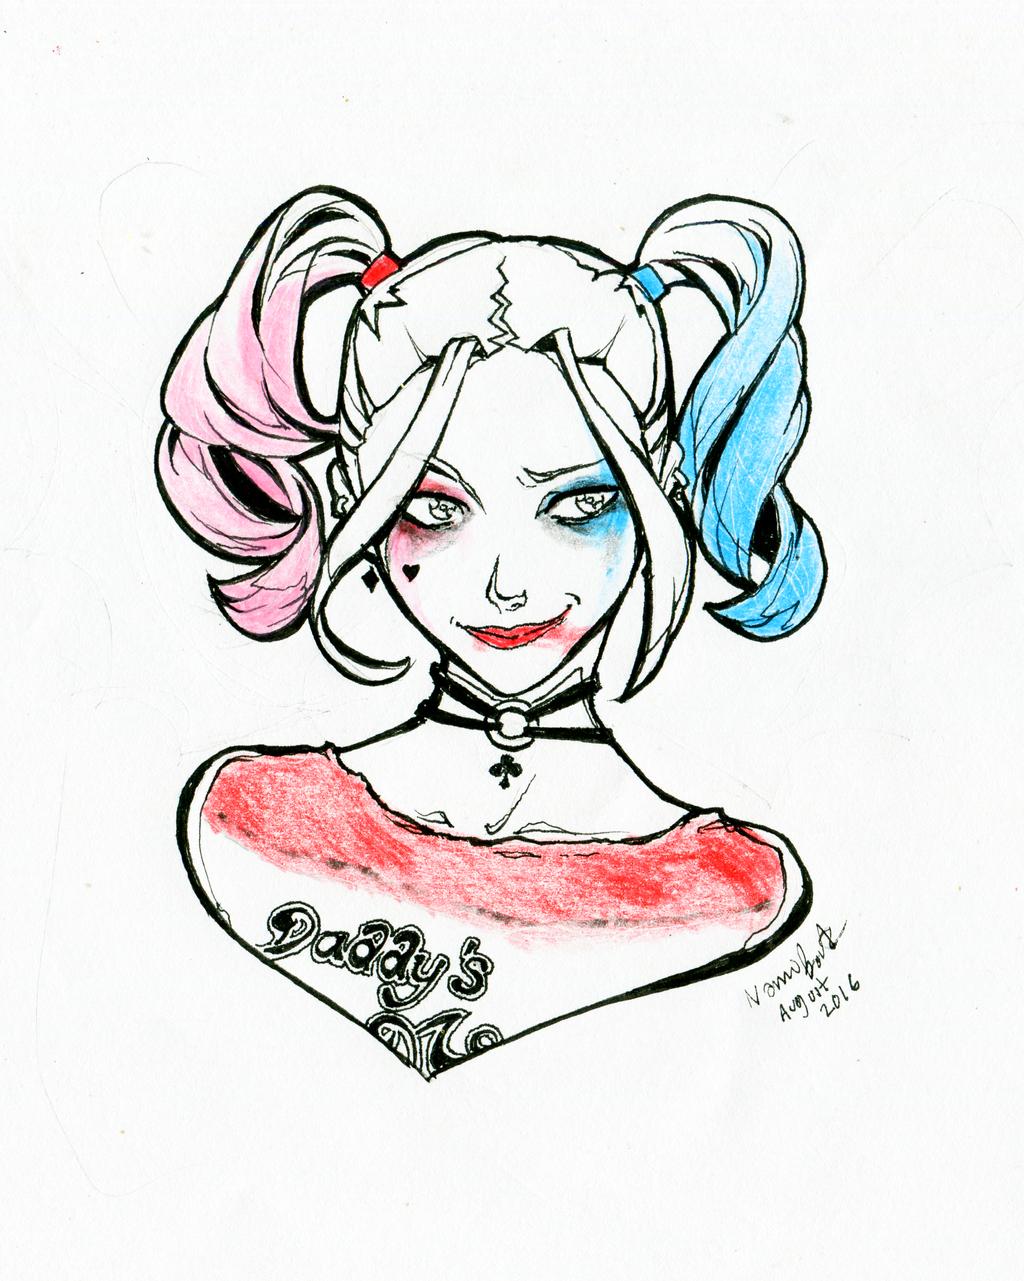 Harley Quinn Drawing: Harley Quinn Suicide Squad By Momijigirl On DeviantArt